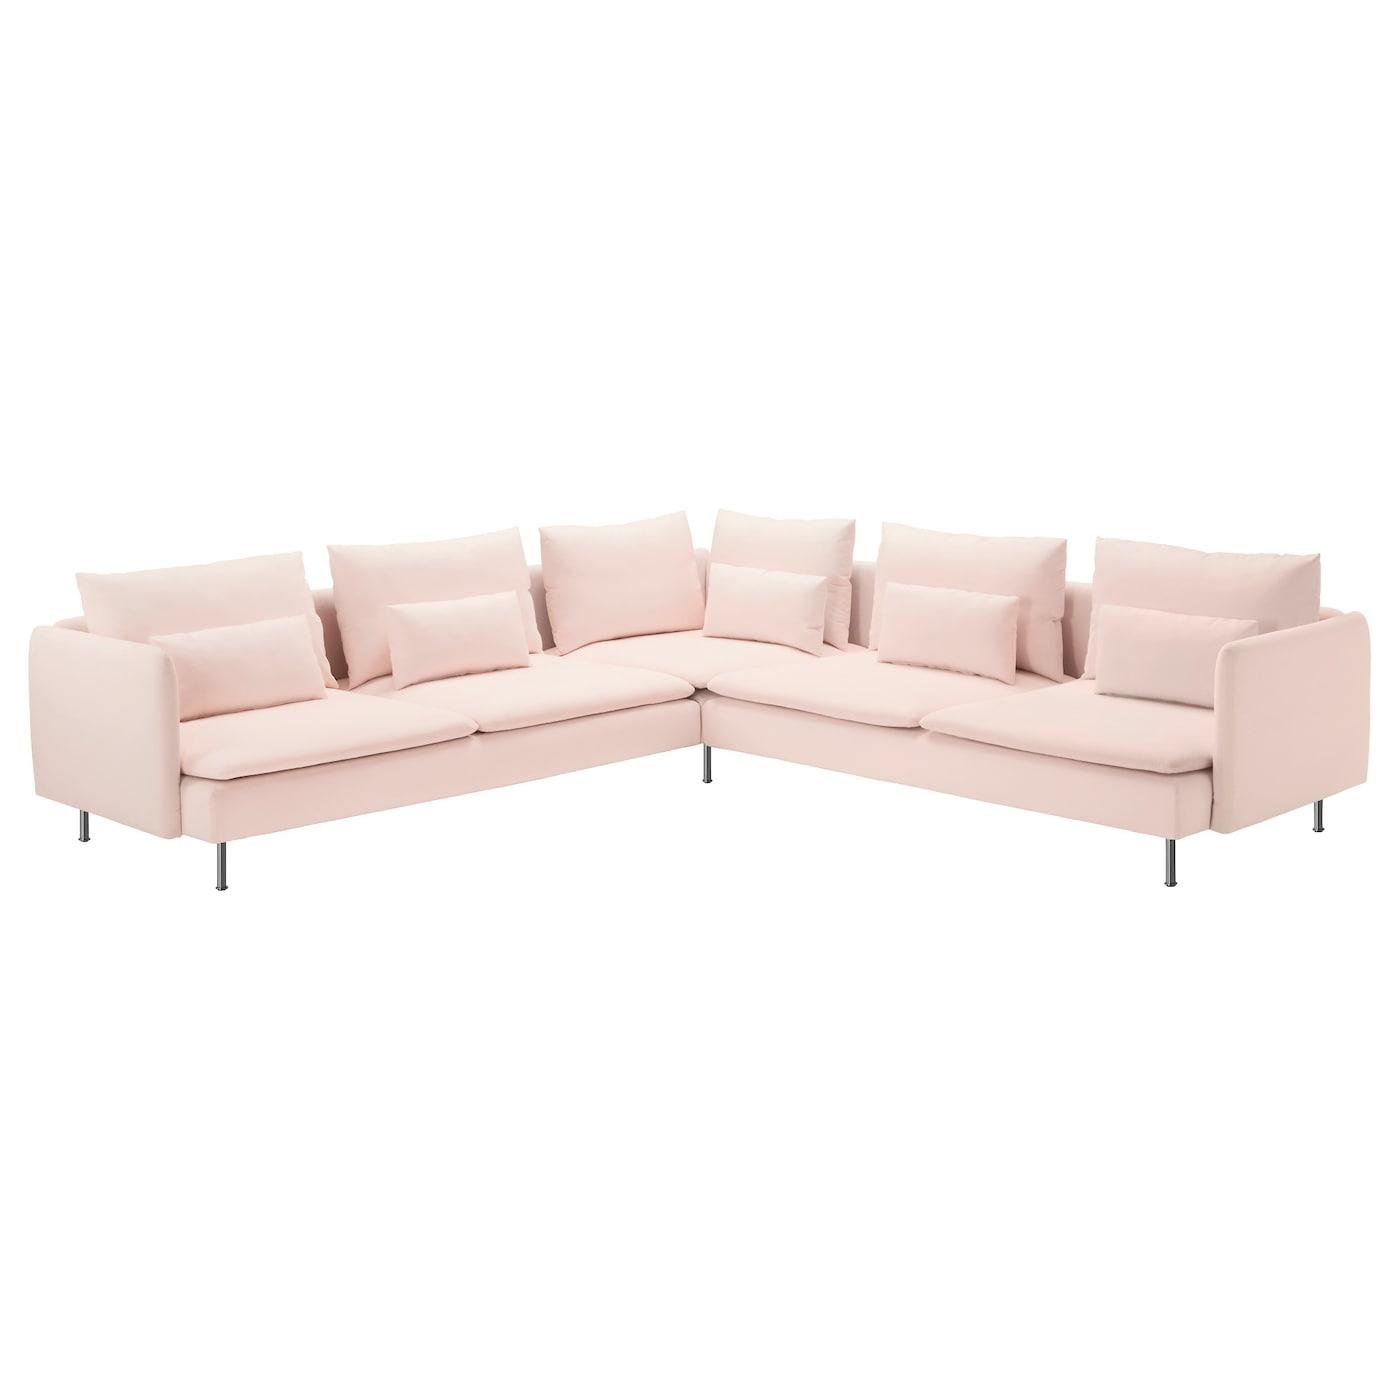 Ikea SÖderhamn Corner Sofa 6 Seat